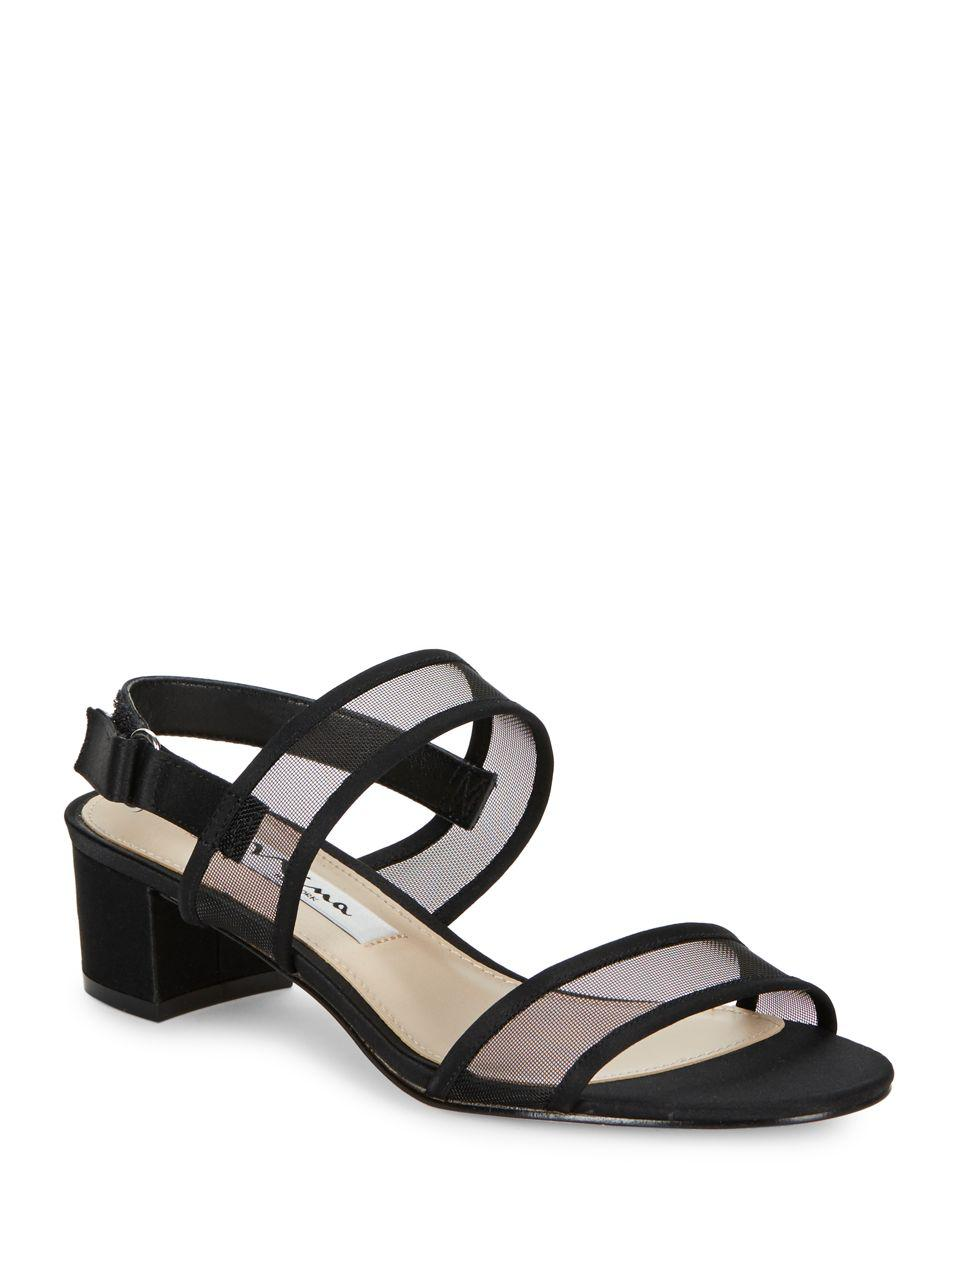 Nina Ganice Mesh & Satin Block Heel Dress Sandals ahhGx3Ao